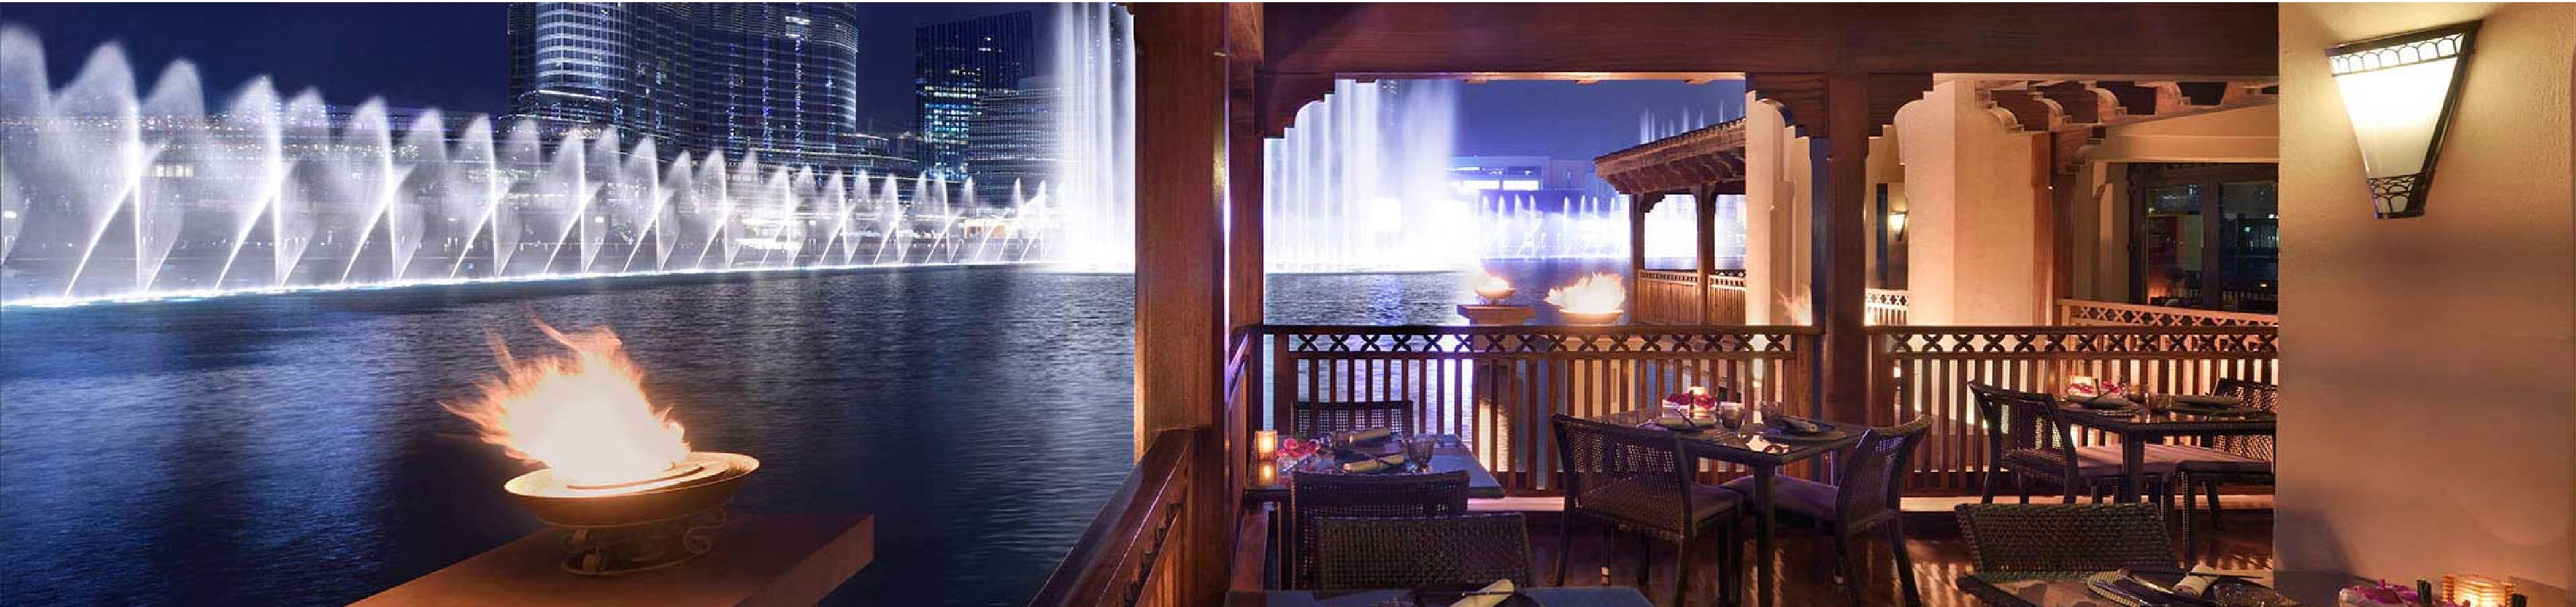 Best Hotels in Dubai: Enjoy a Luxurious Accommodation in Dubai